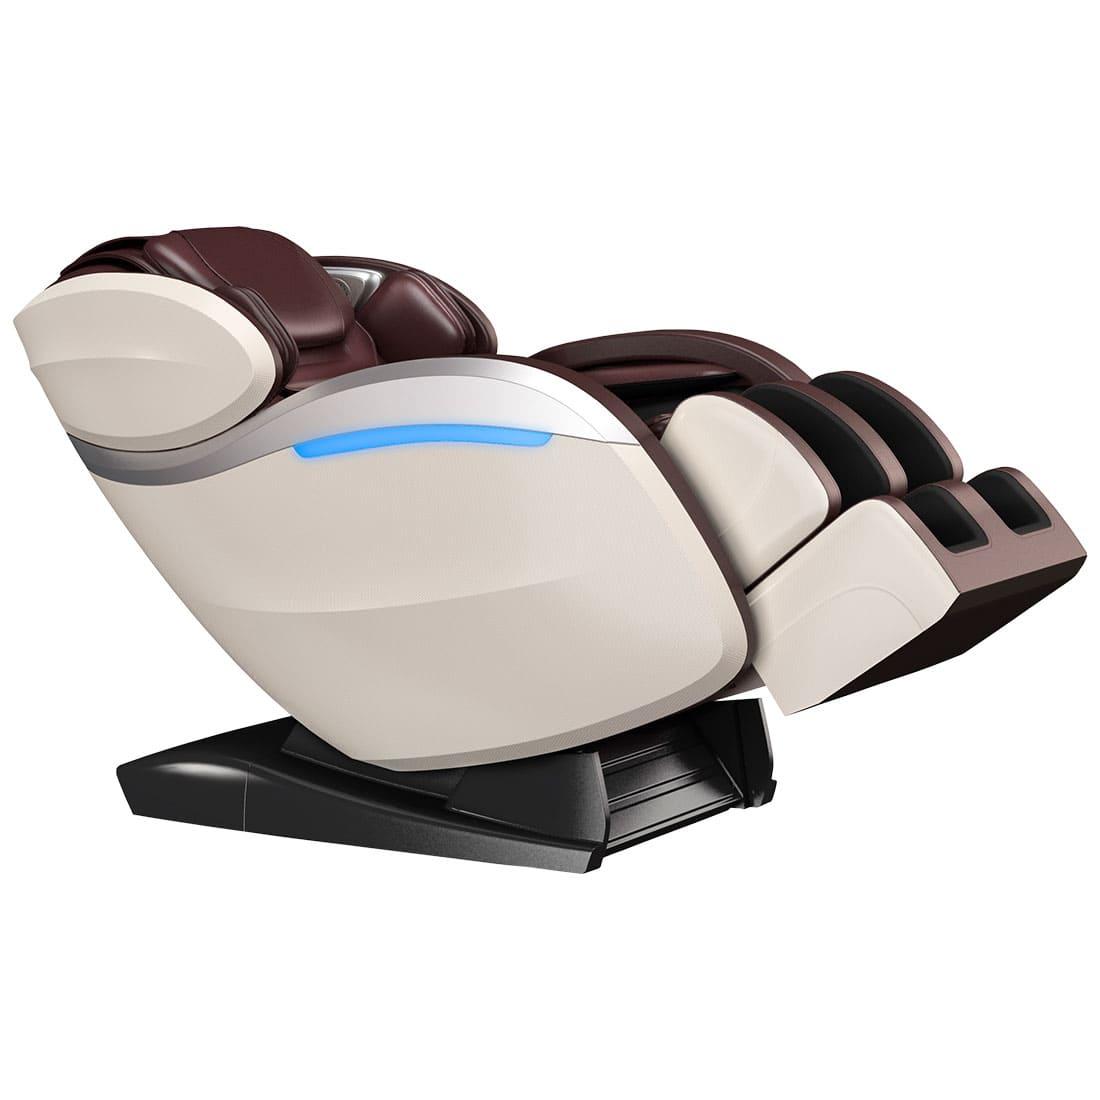 Futuro Массажное кресло (коричнево-бежевое)